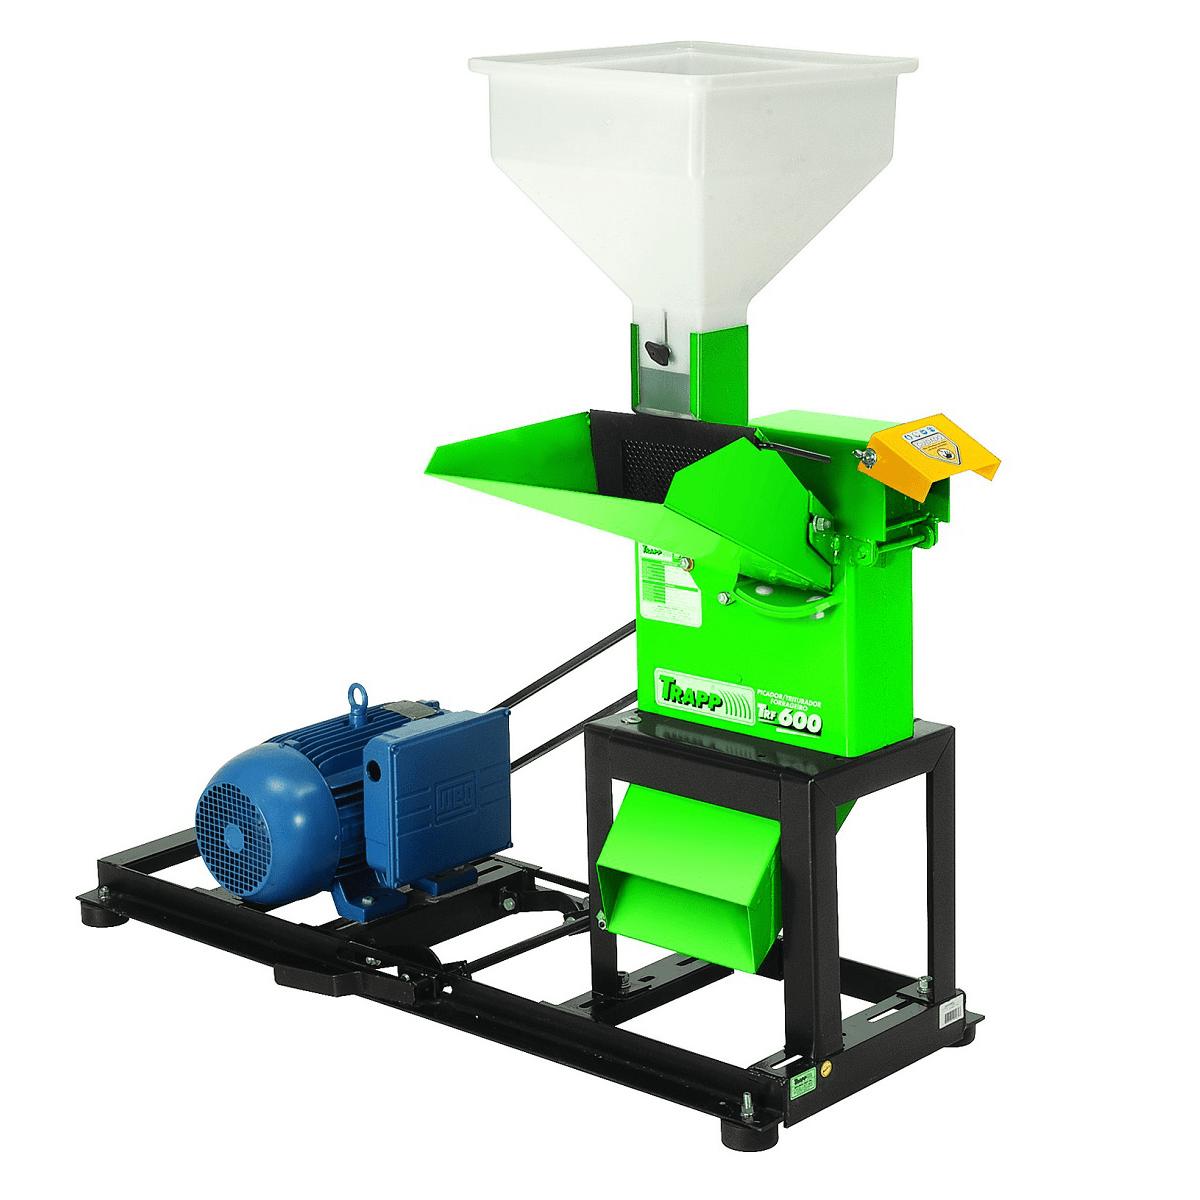 Triturador Forrageiro TRF - 600 5,0cv 60hz 220/440v Monofásico